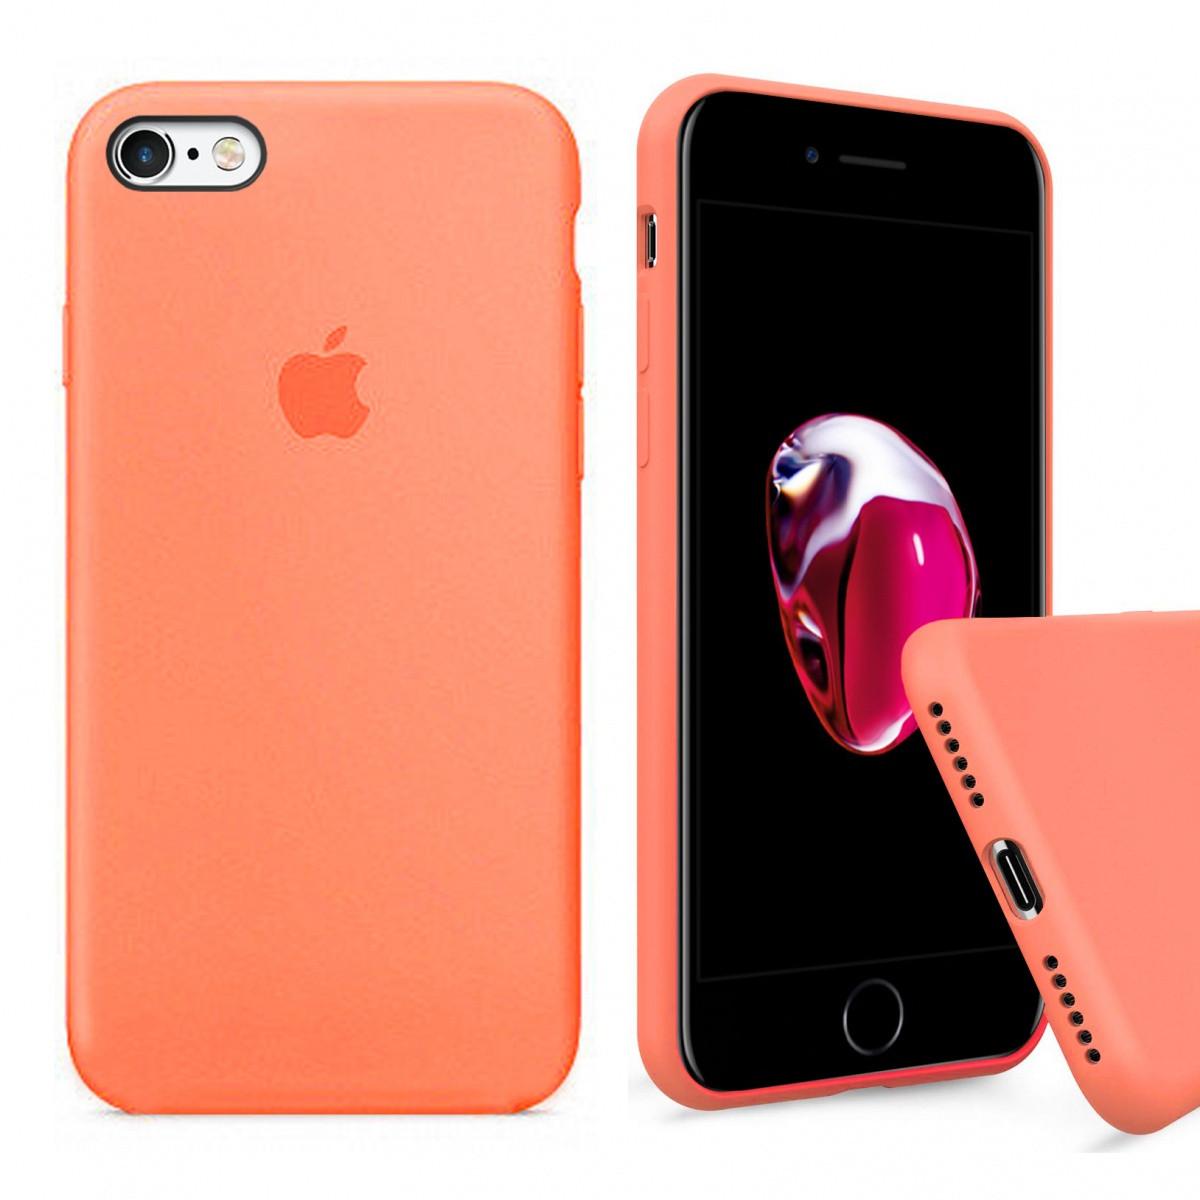 Samsung / Чехол накладка xCase для iPhone 6/6s Silicone Case Full papaya